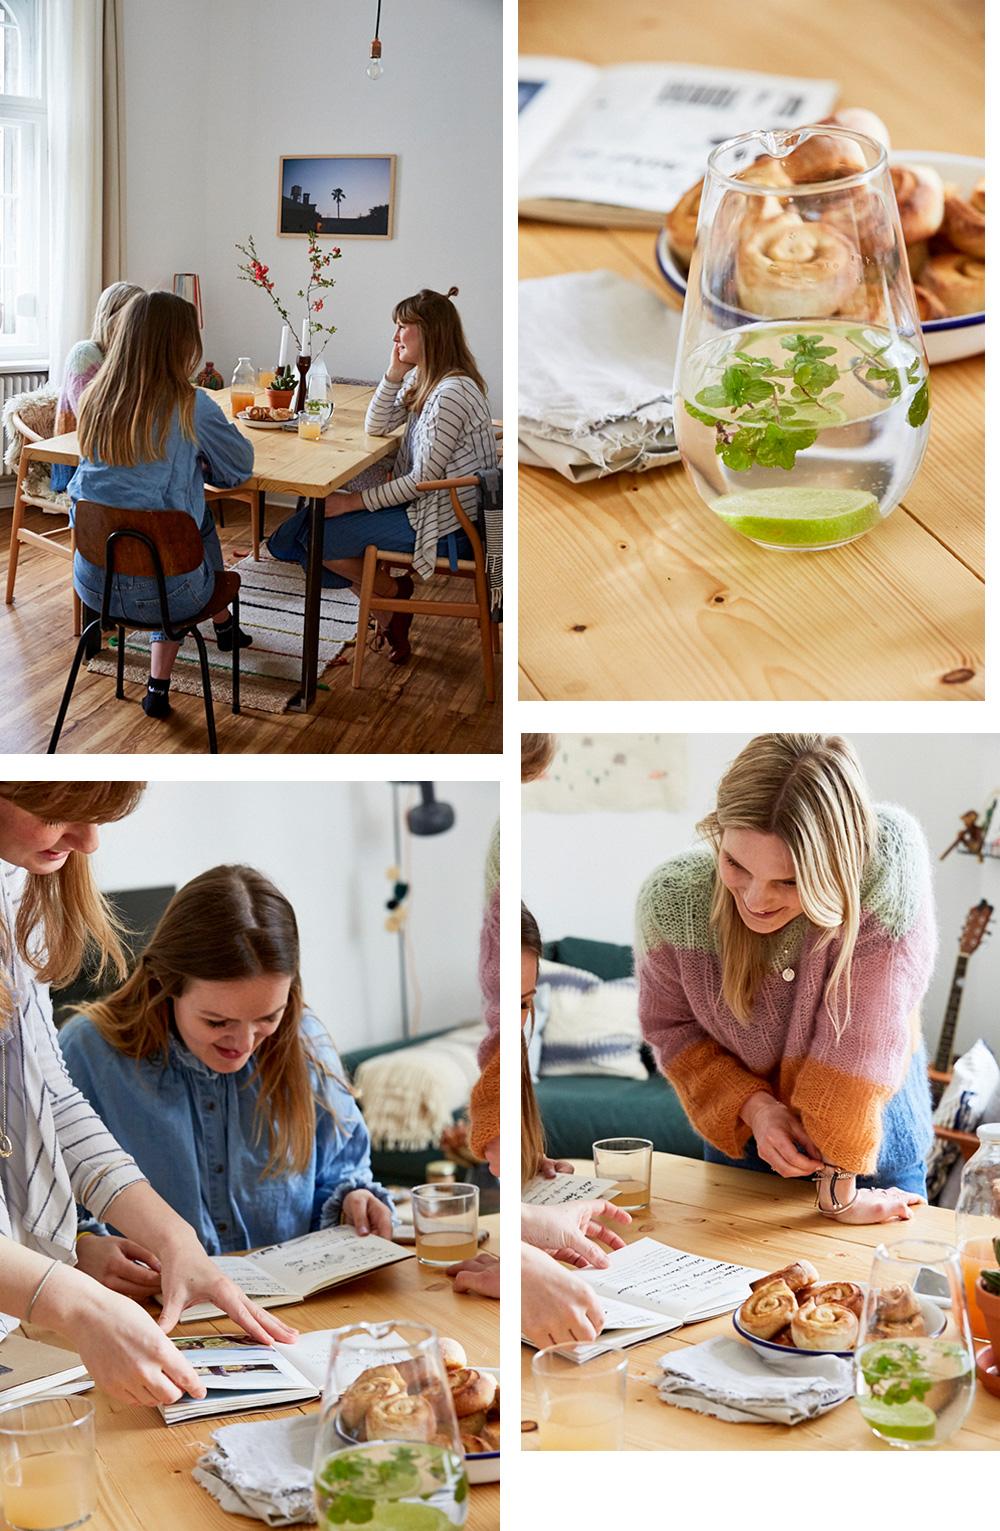 femtastics-Sarah-Neuendorf-Gretas-Schwester-Interview